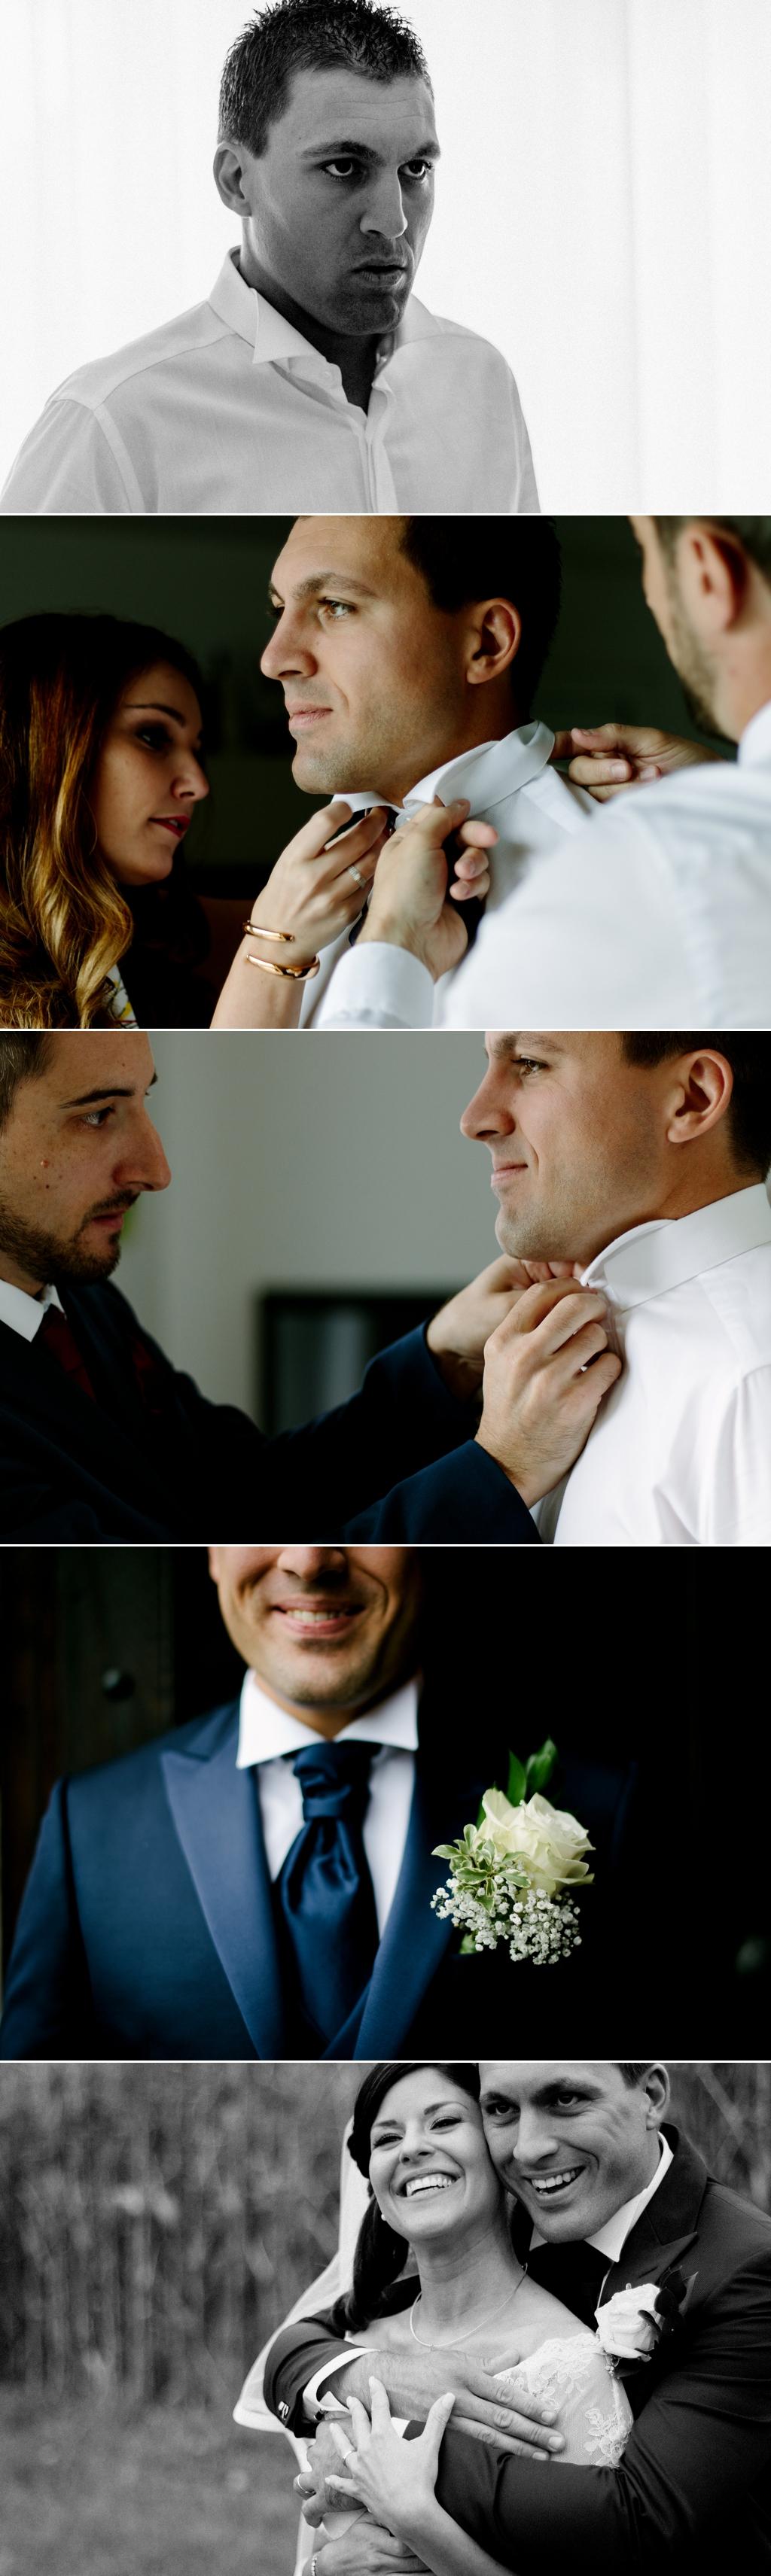 fotografo matrimonio preparativi sposo